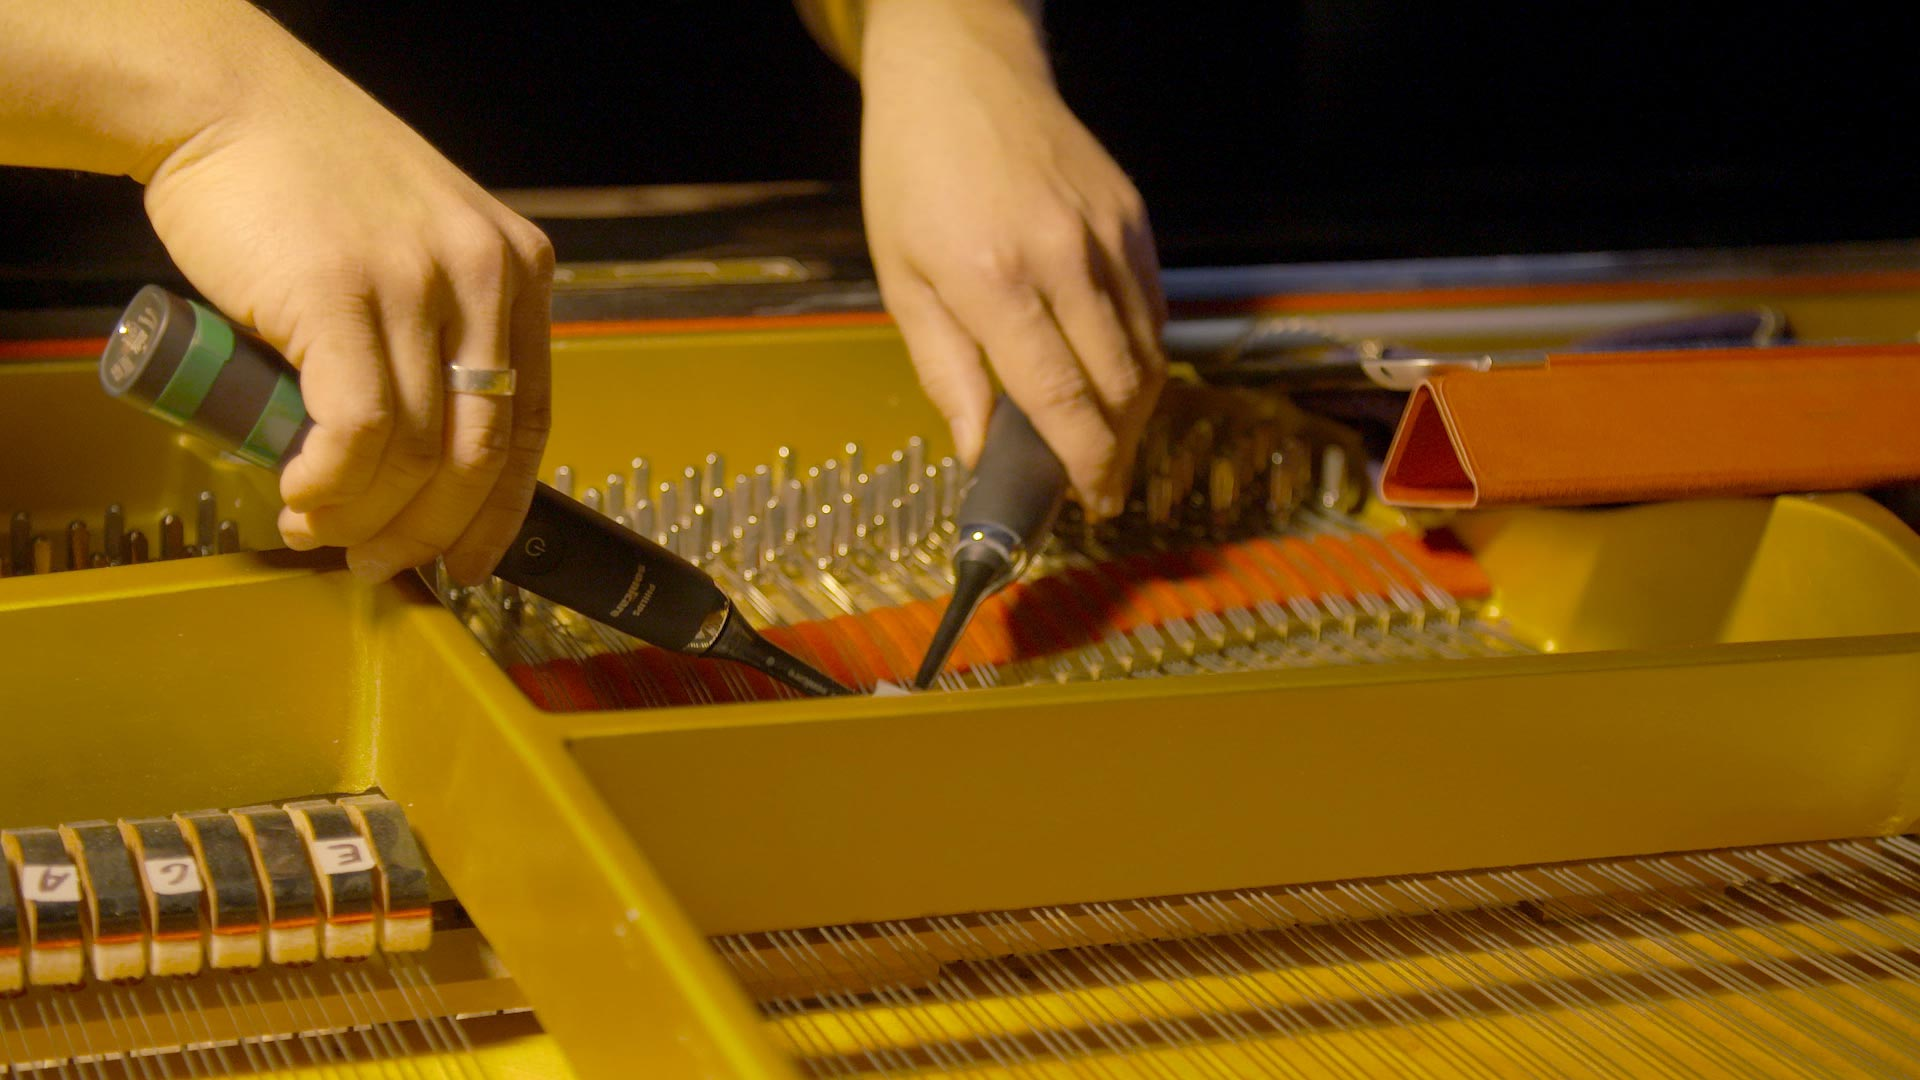 Philips Sonicare DiamondClean at Studio 17